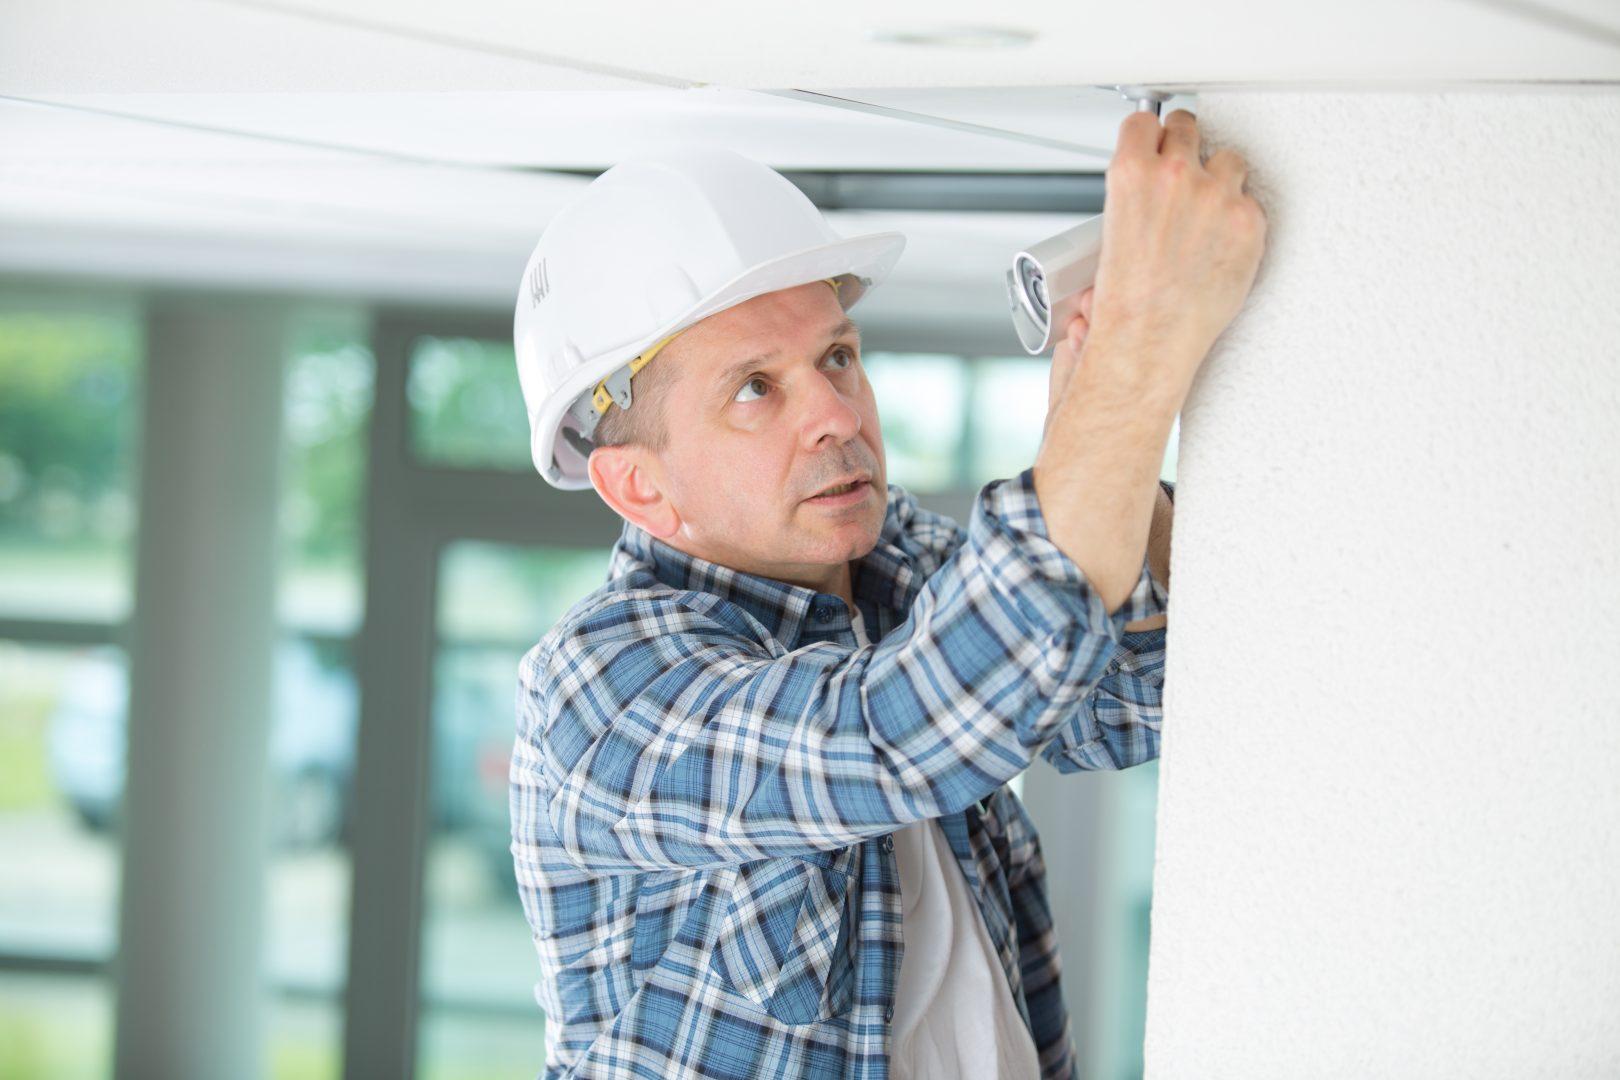 professional-electrician-replacing-the-light-bulb-PFLDF4U